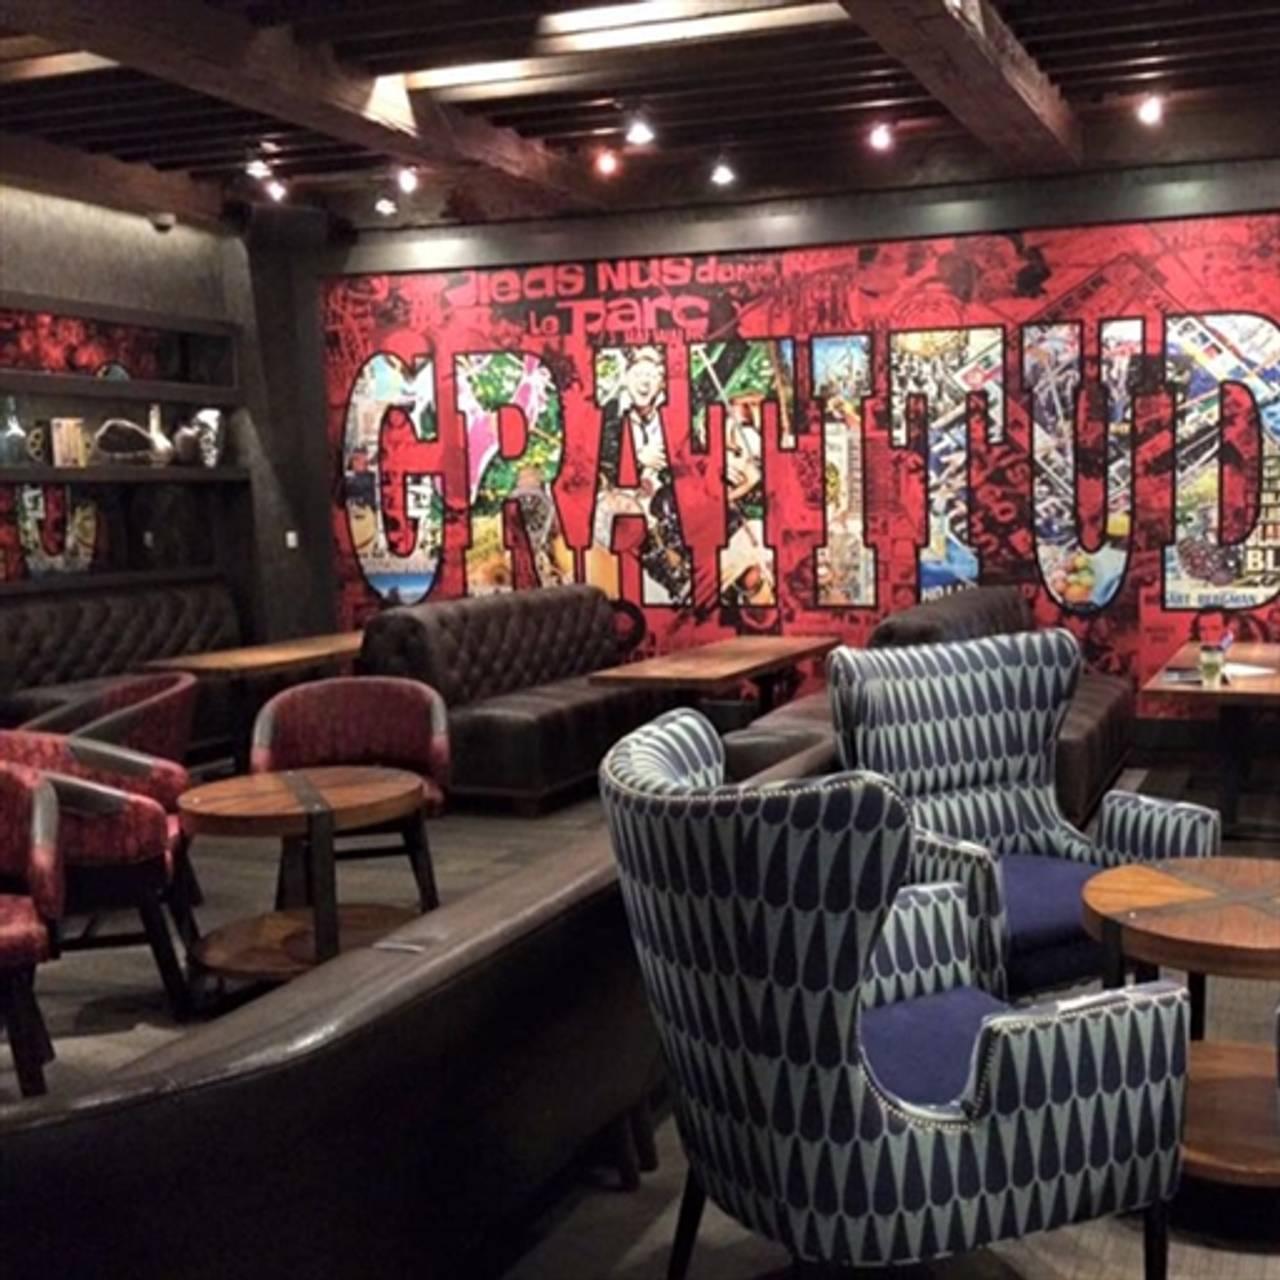 The Tuck Room Houston Restaurant Houston TX OpenTable - Open table houston